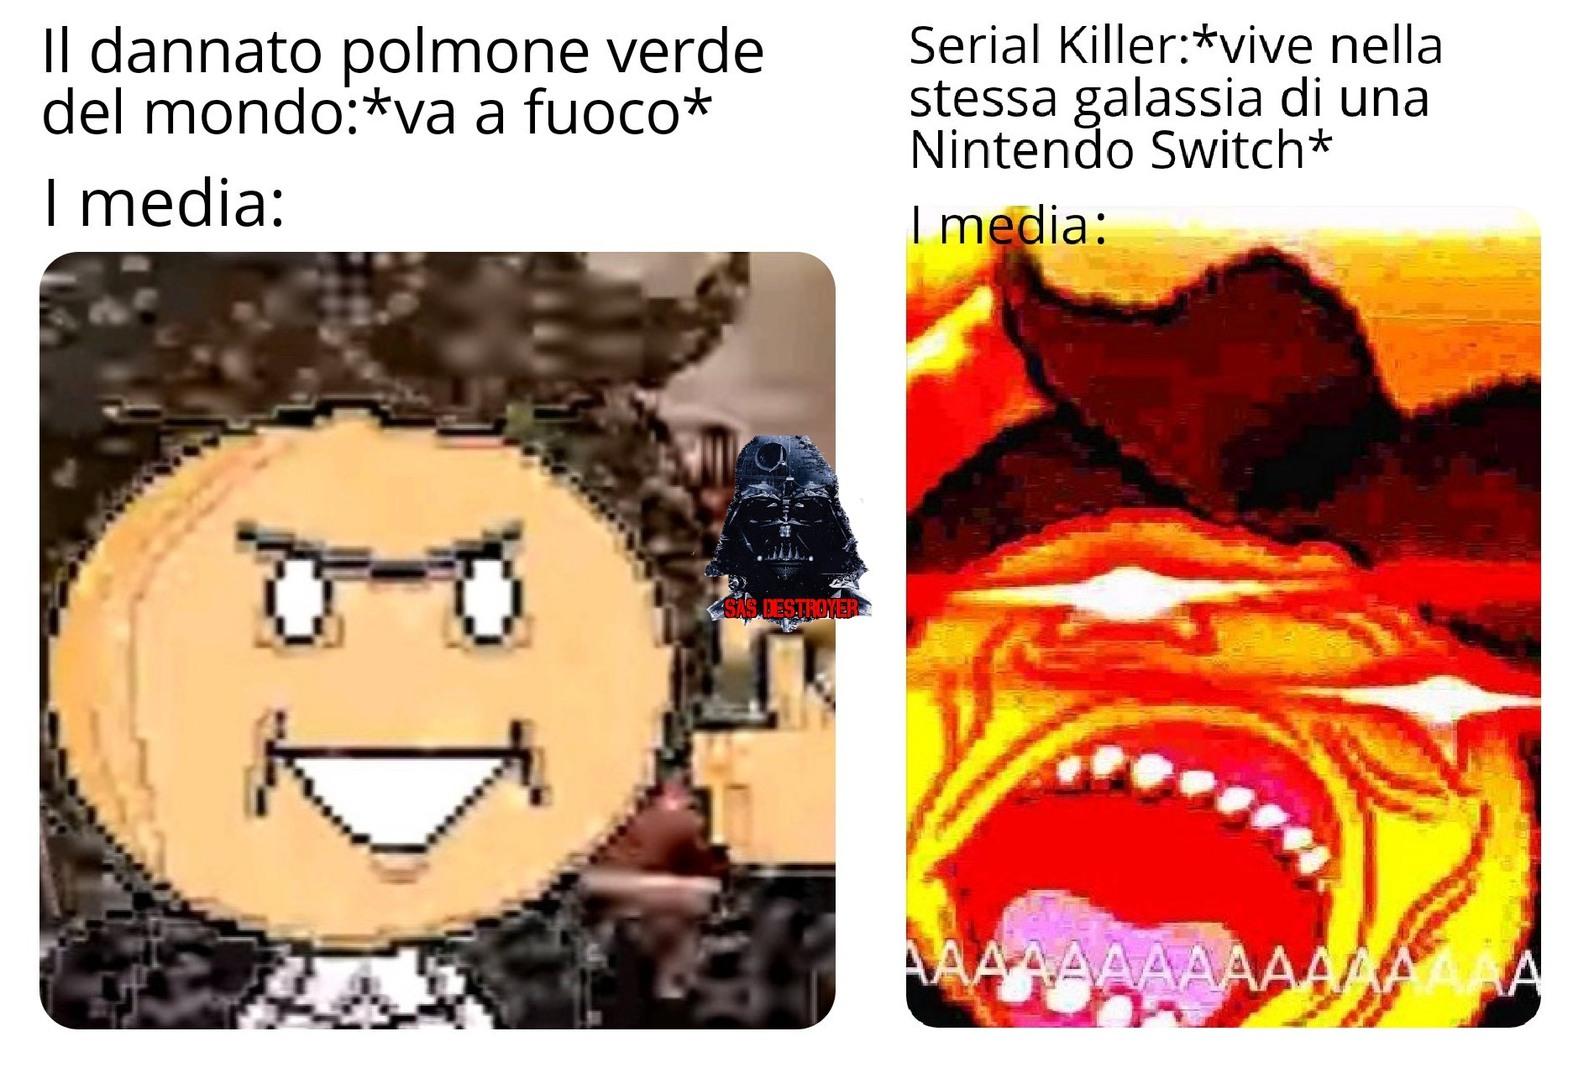 Mi piace fare memes usando Baddo?